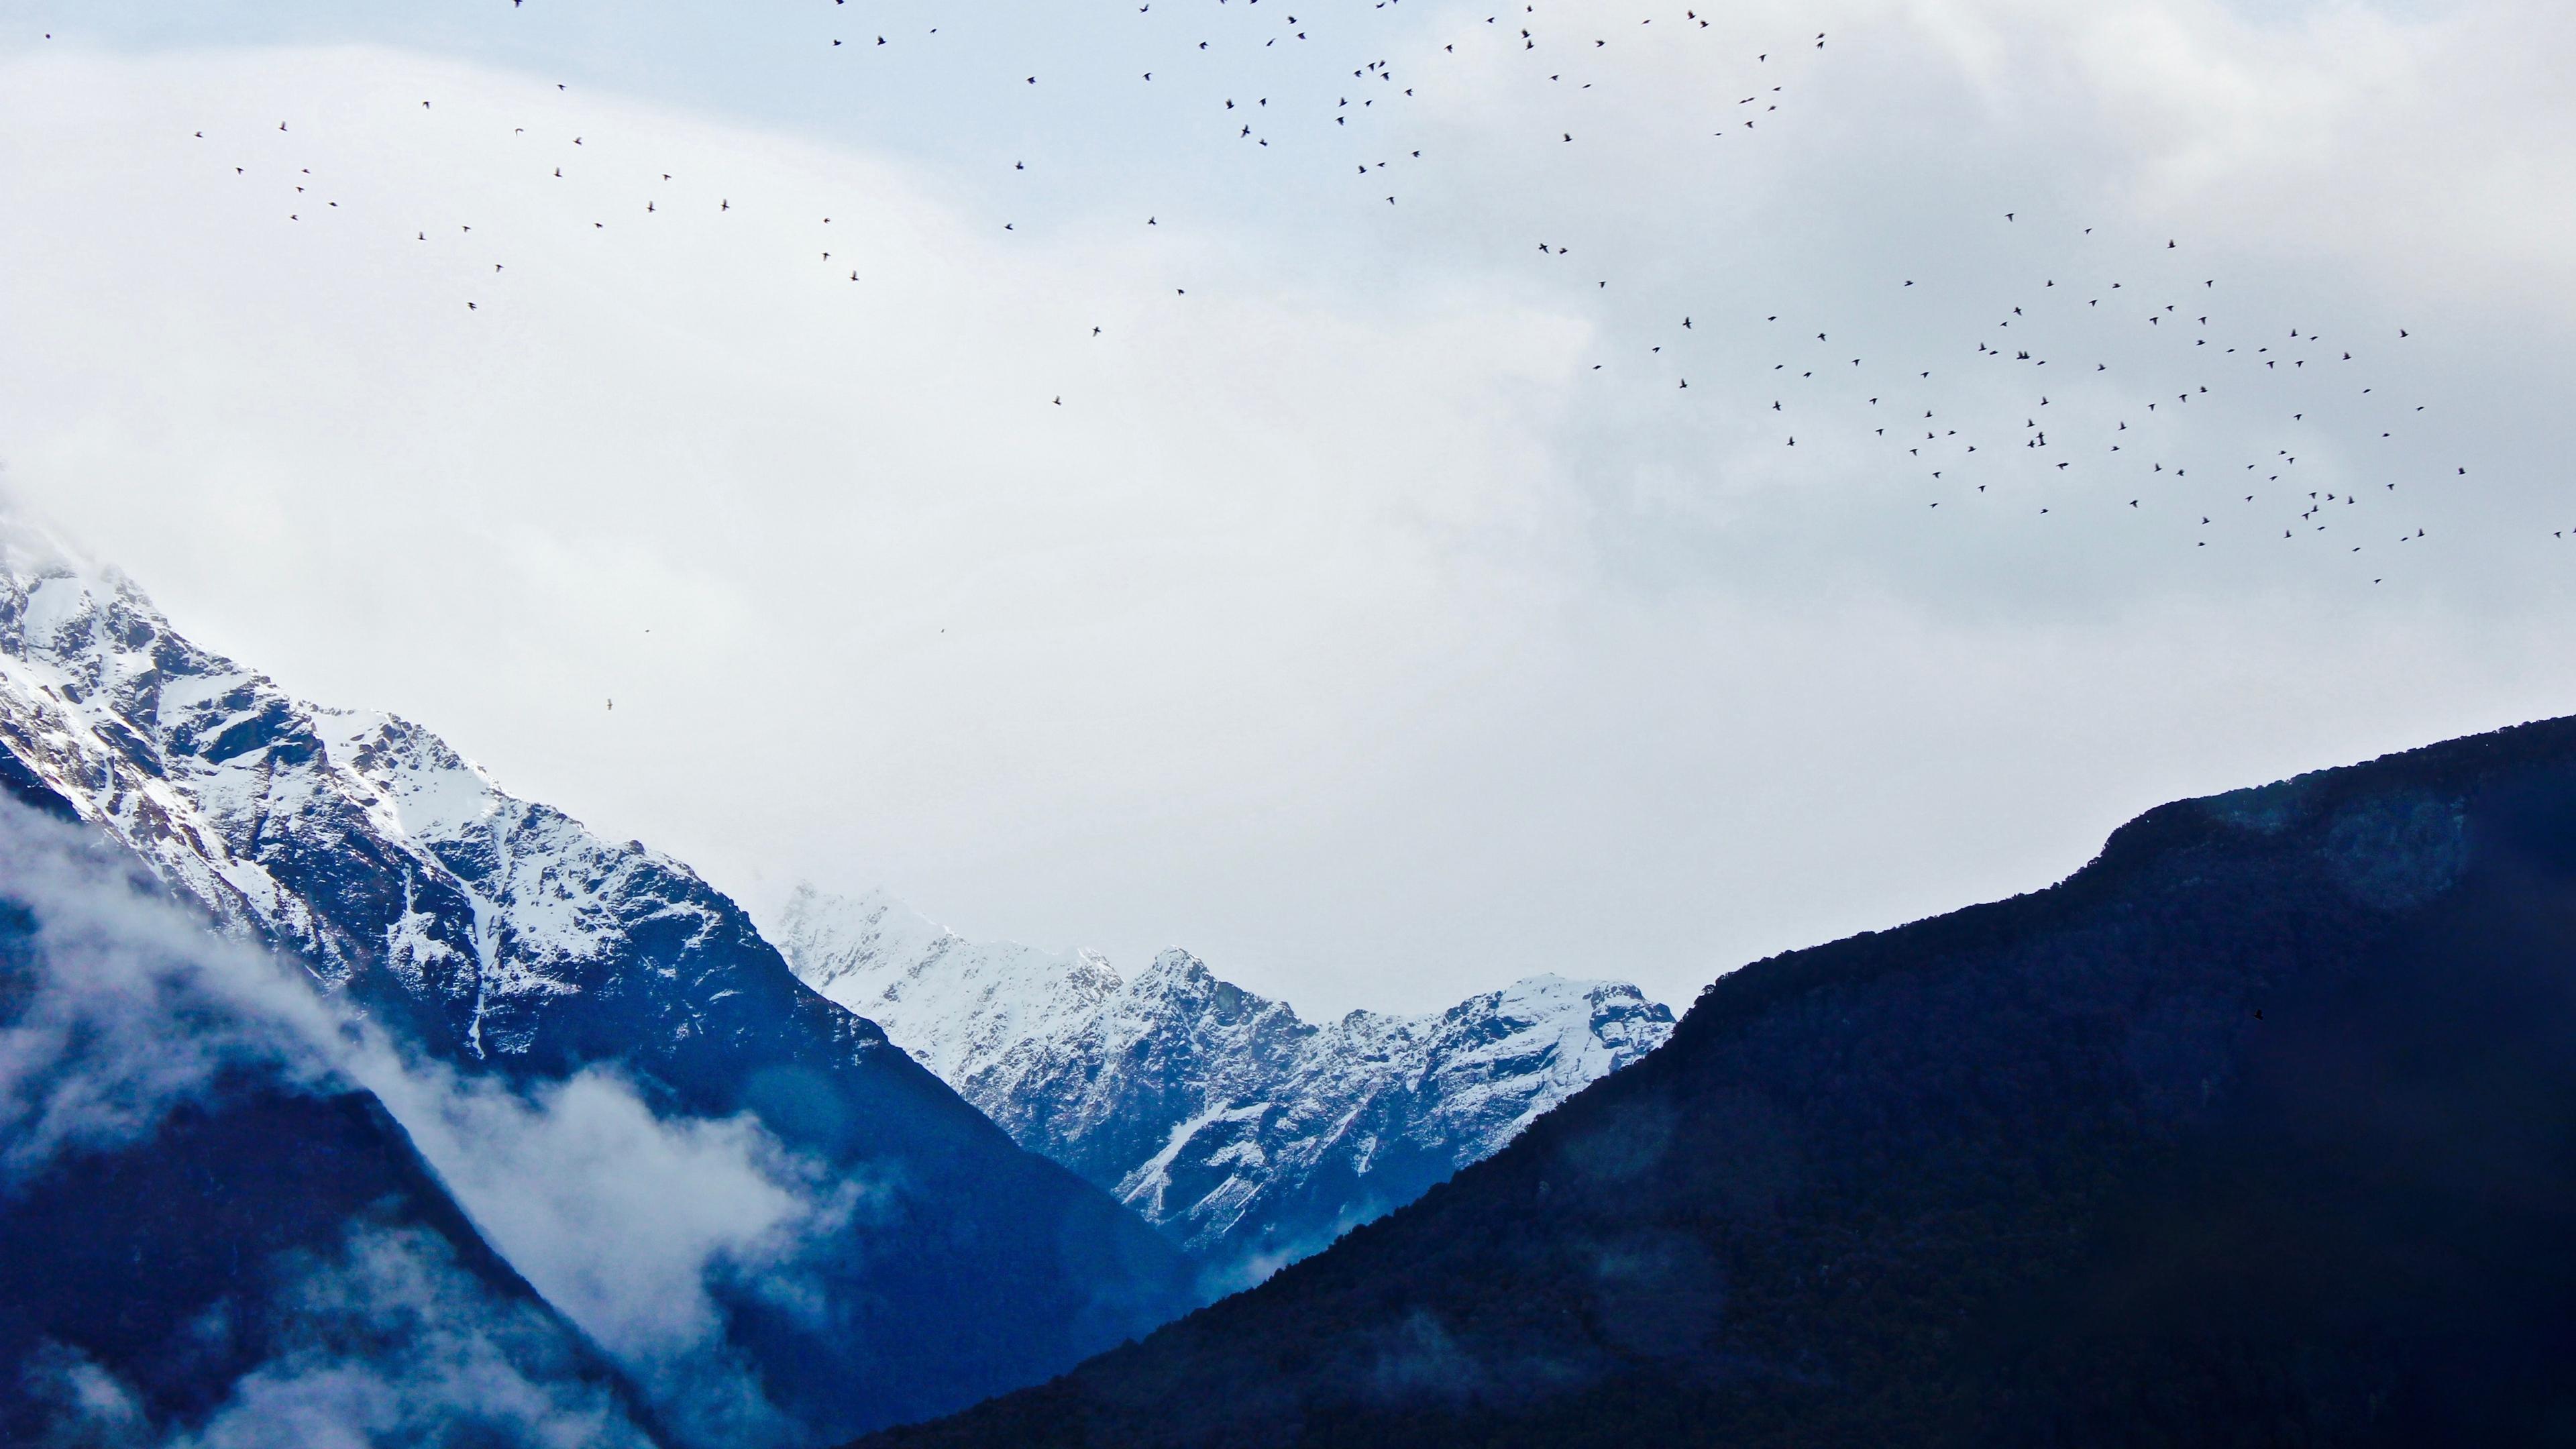 mountains sky top birds 4k 1541117877 - mountains, sky, top, birds 4k - top, Sky, Mountains